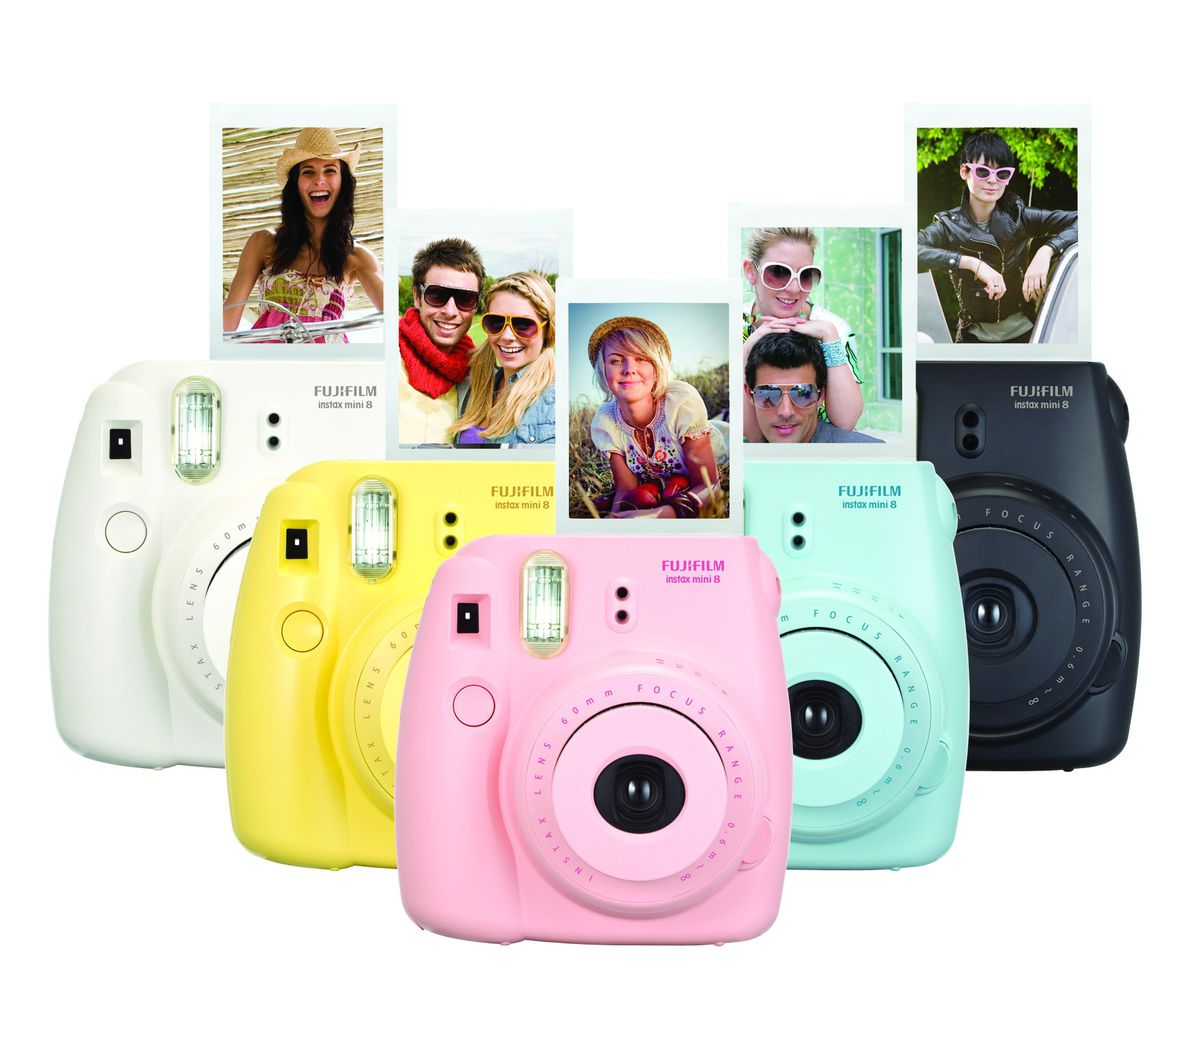 Fujifilm Instax Mini 8 Camera Blue | Buy Online in South Africa ...